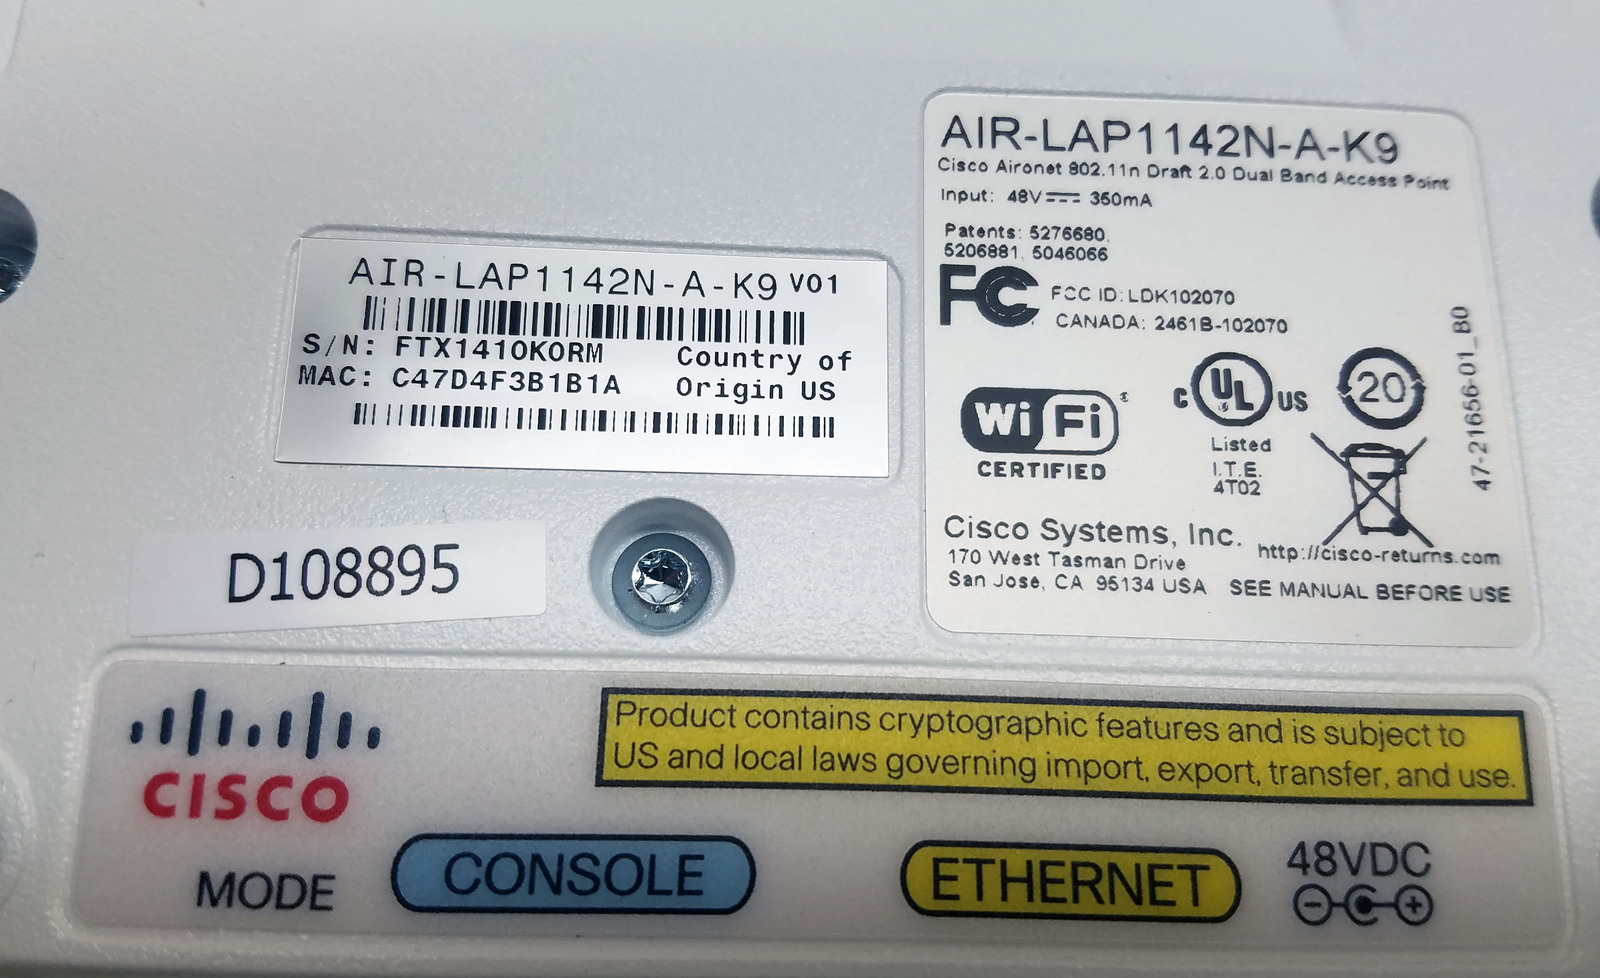 (Lot of 10) Cisco Air-Lap1142N-A-K9 Dual Band Access Points Bin:1